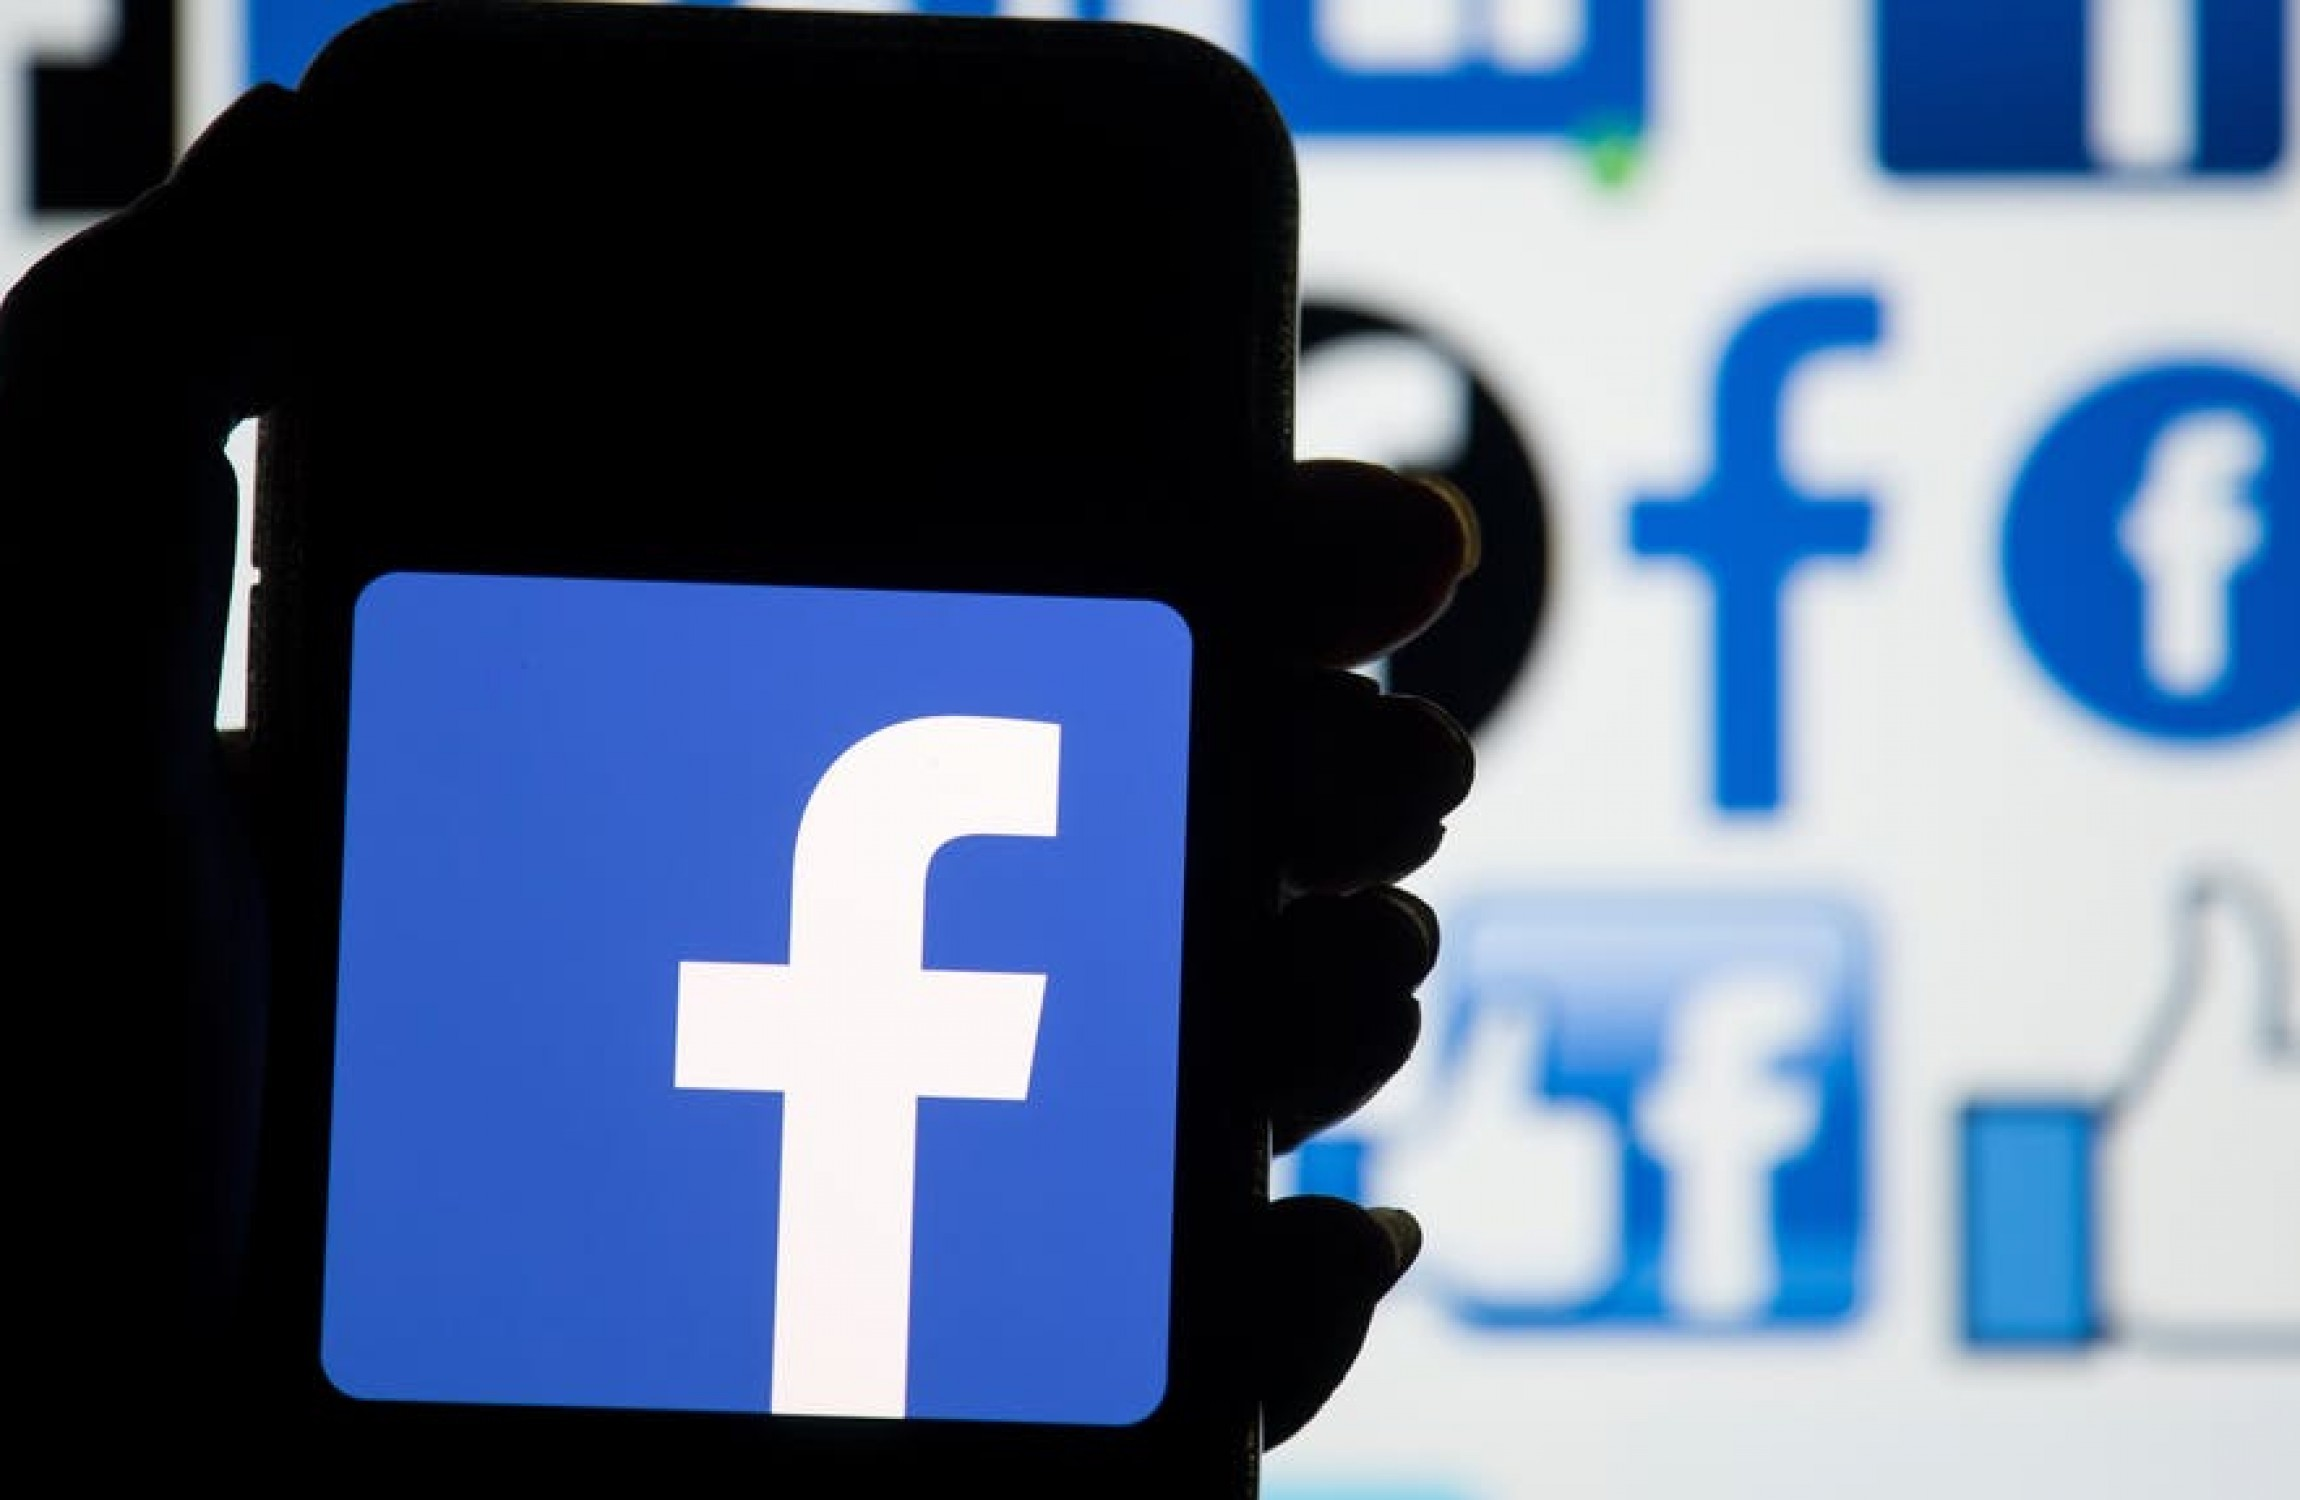 Facebook strikes landmark deals with Australian media companies